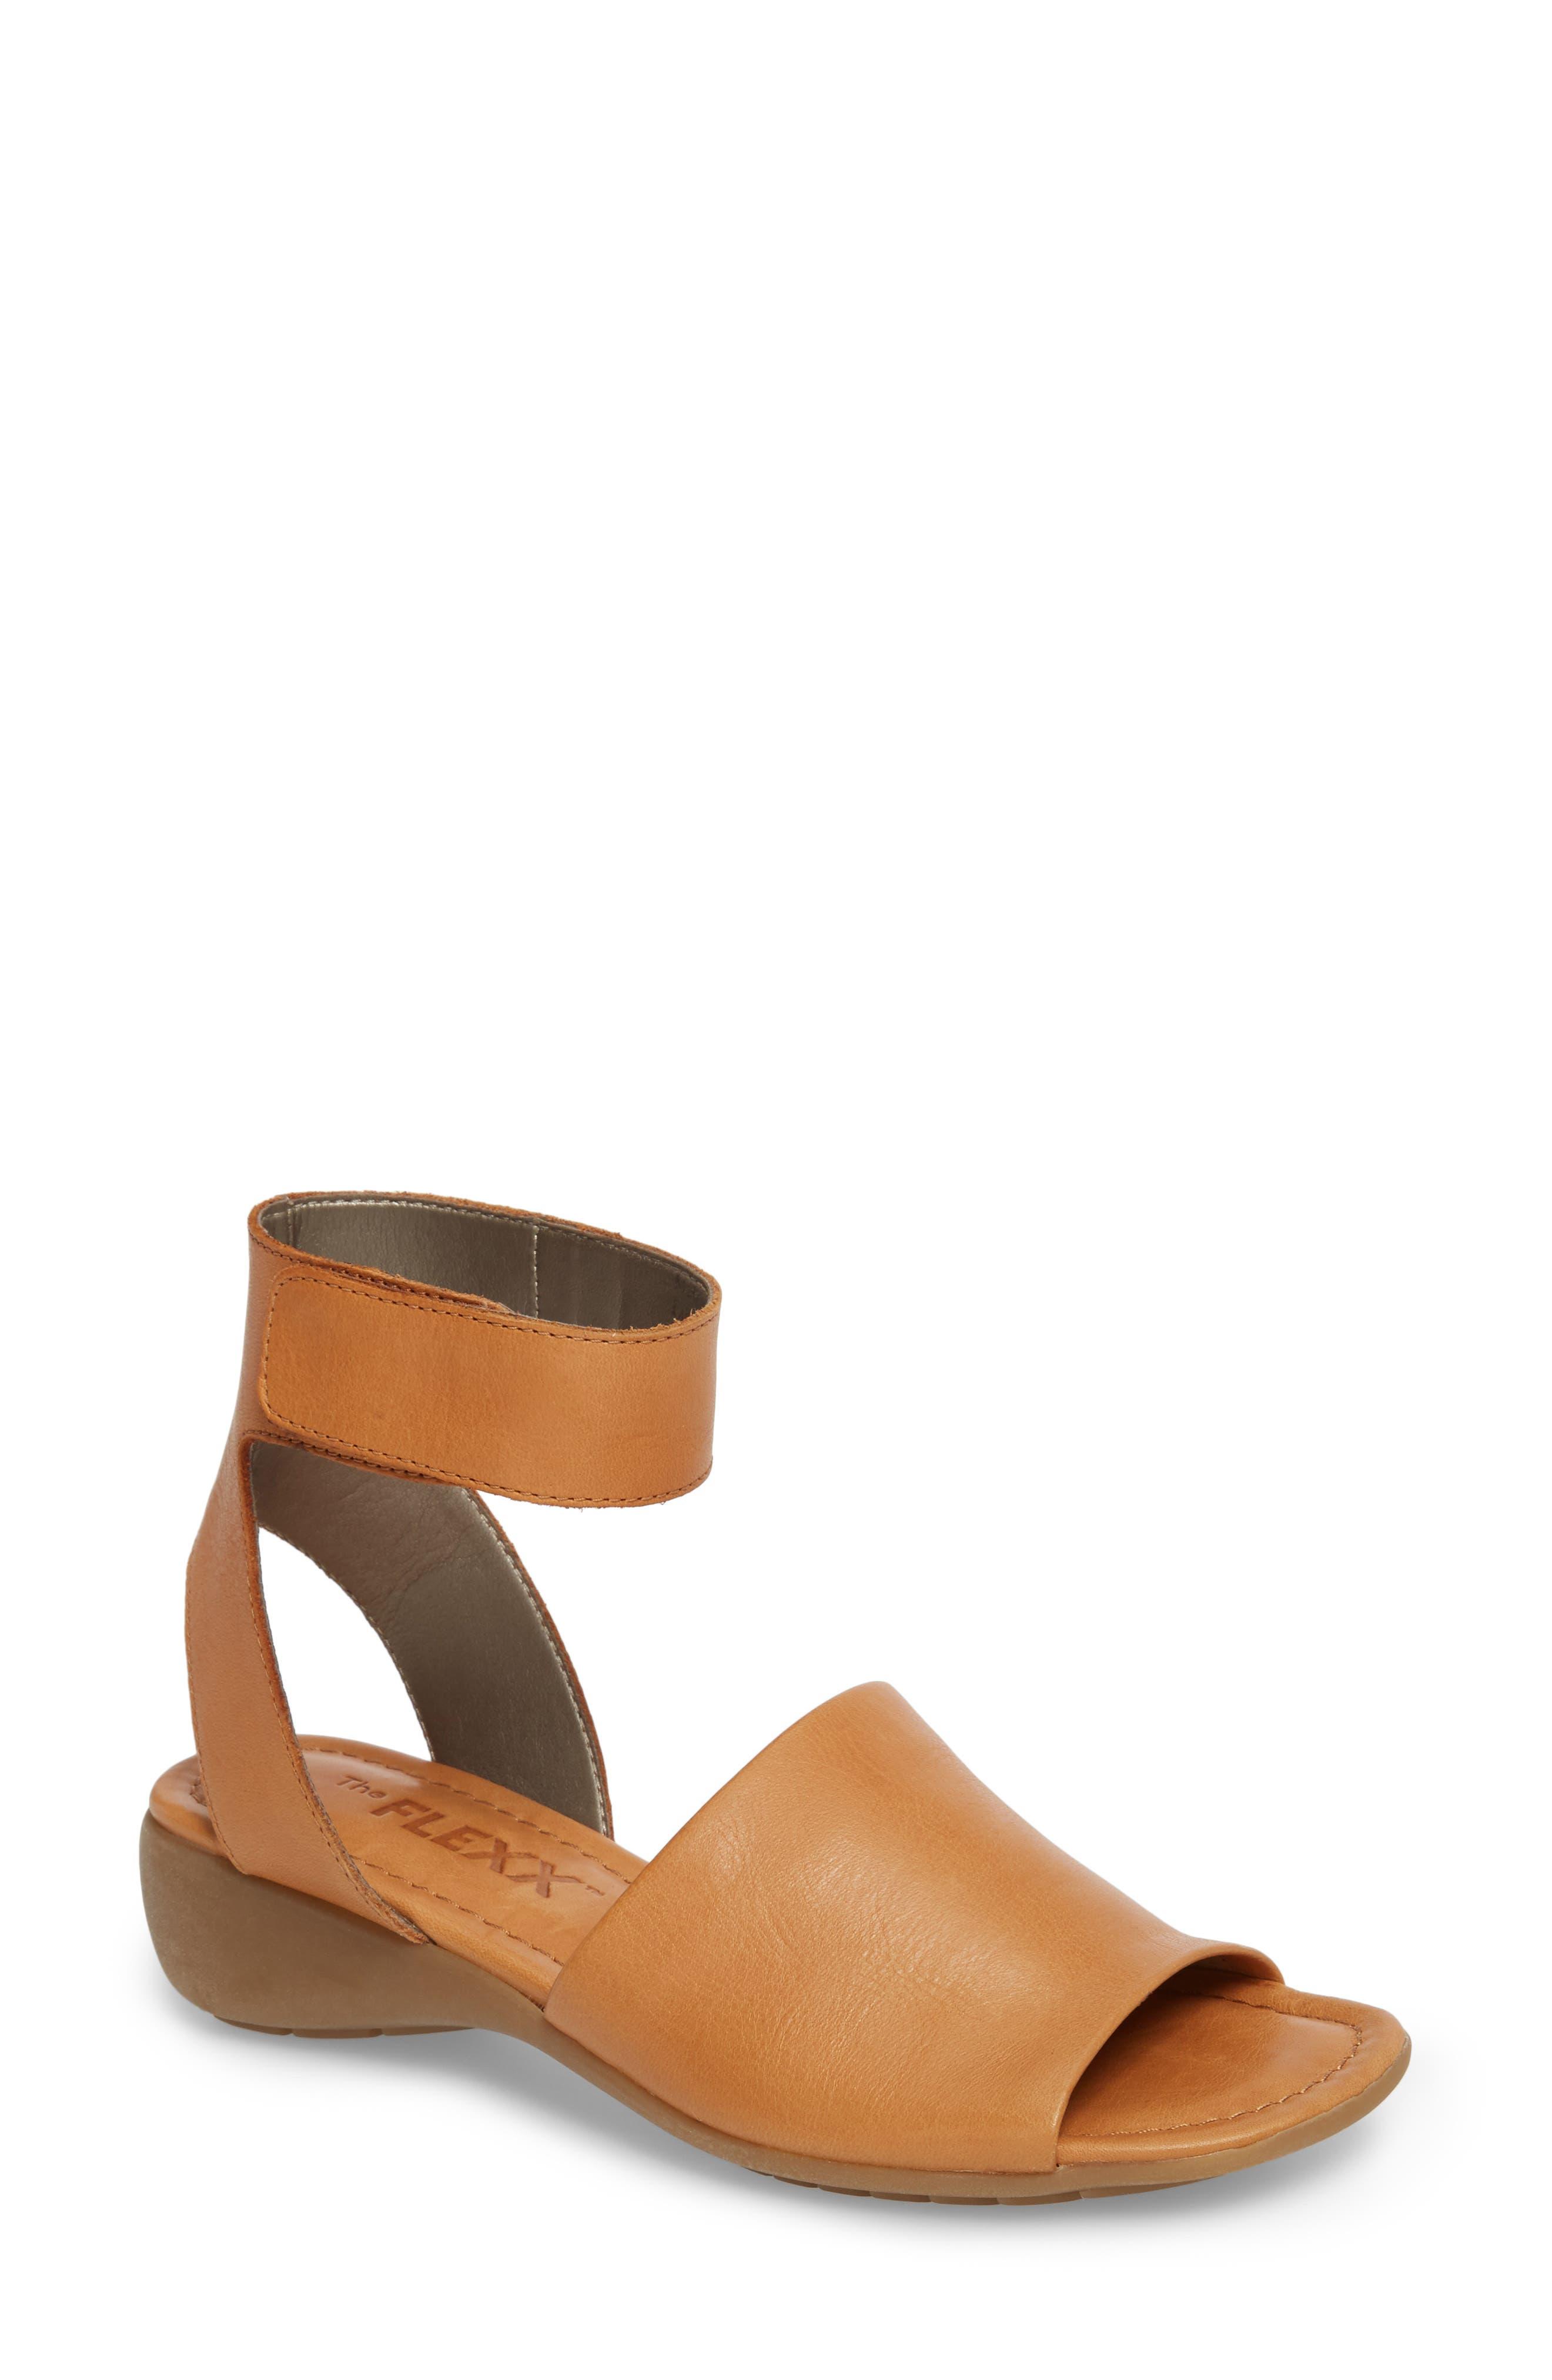 'Beglad' Leather Ankle Strap Sandal,                             Main thumbnail 3, color,